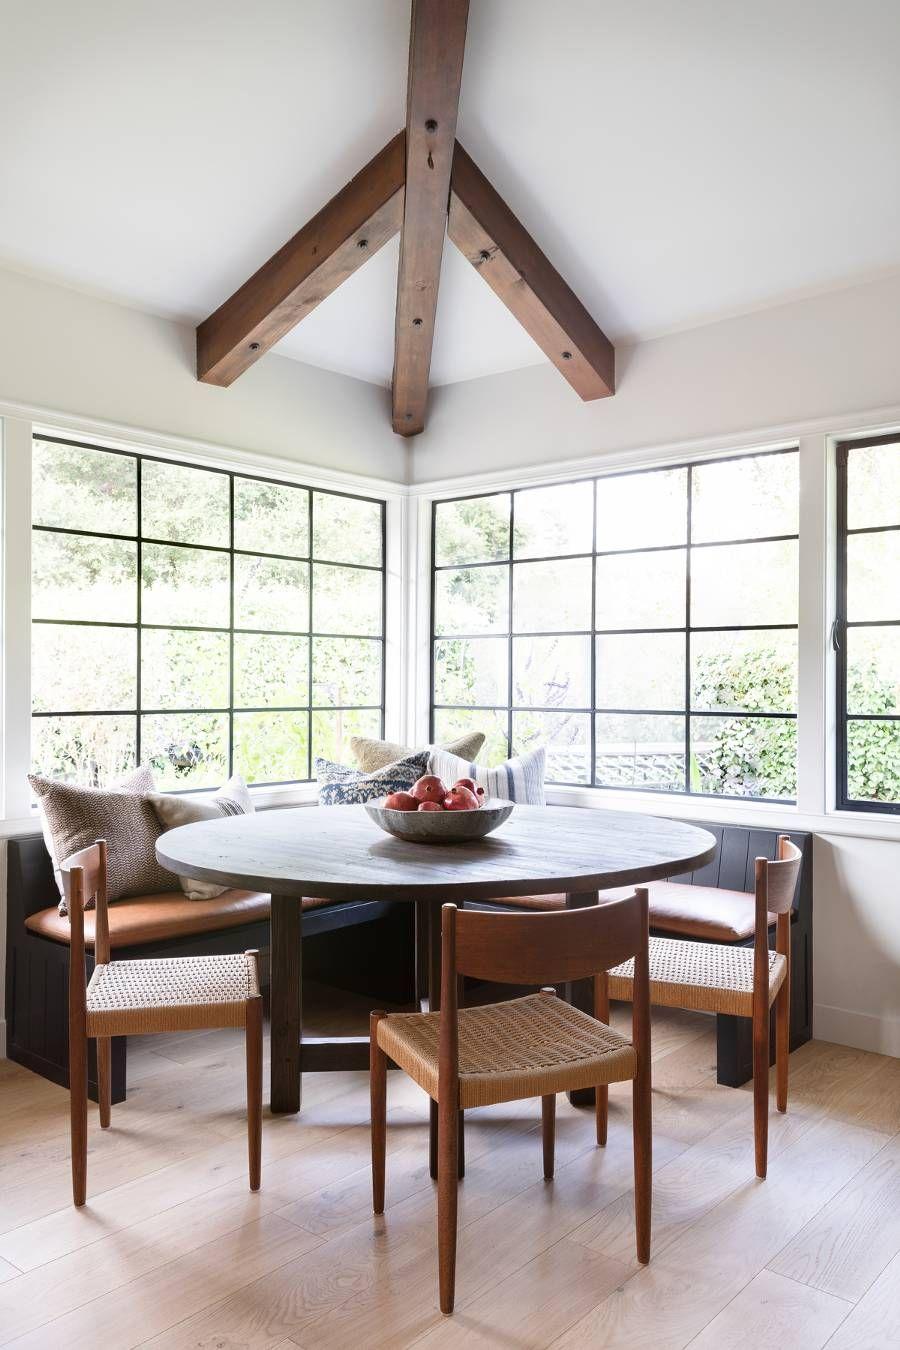 The One Interior Design Blog You Need To Follow Interior Design